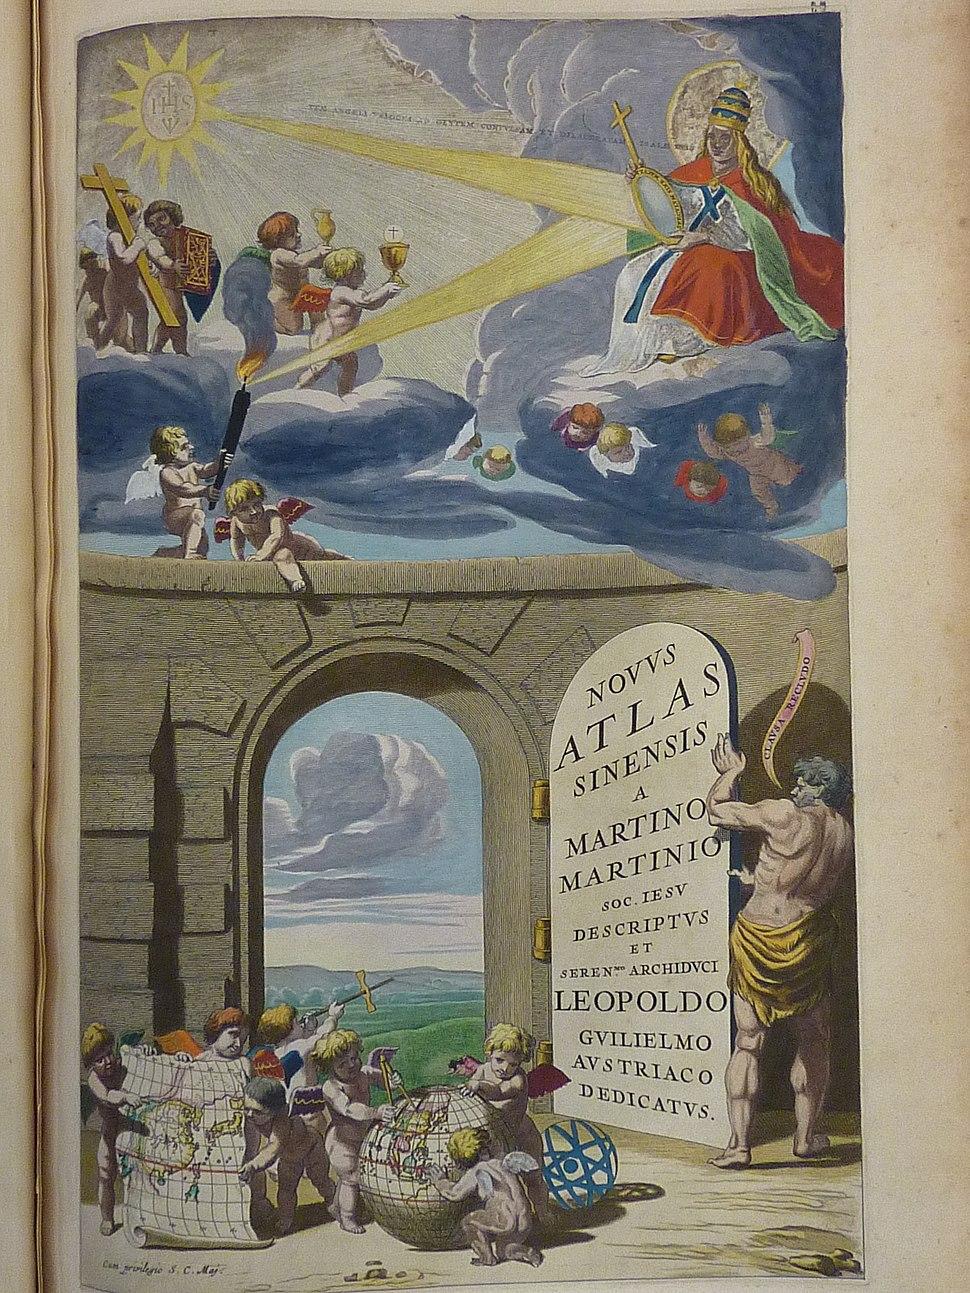 Atlas maior 1655 - vol 10 - Novus Atlas Sinensis - cover - P1080377